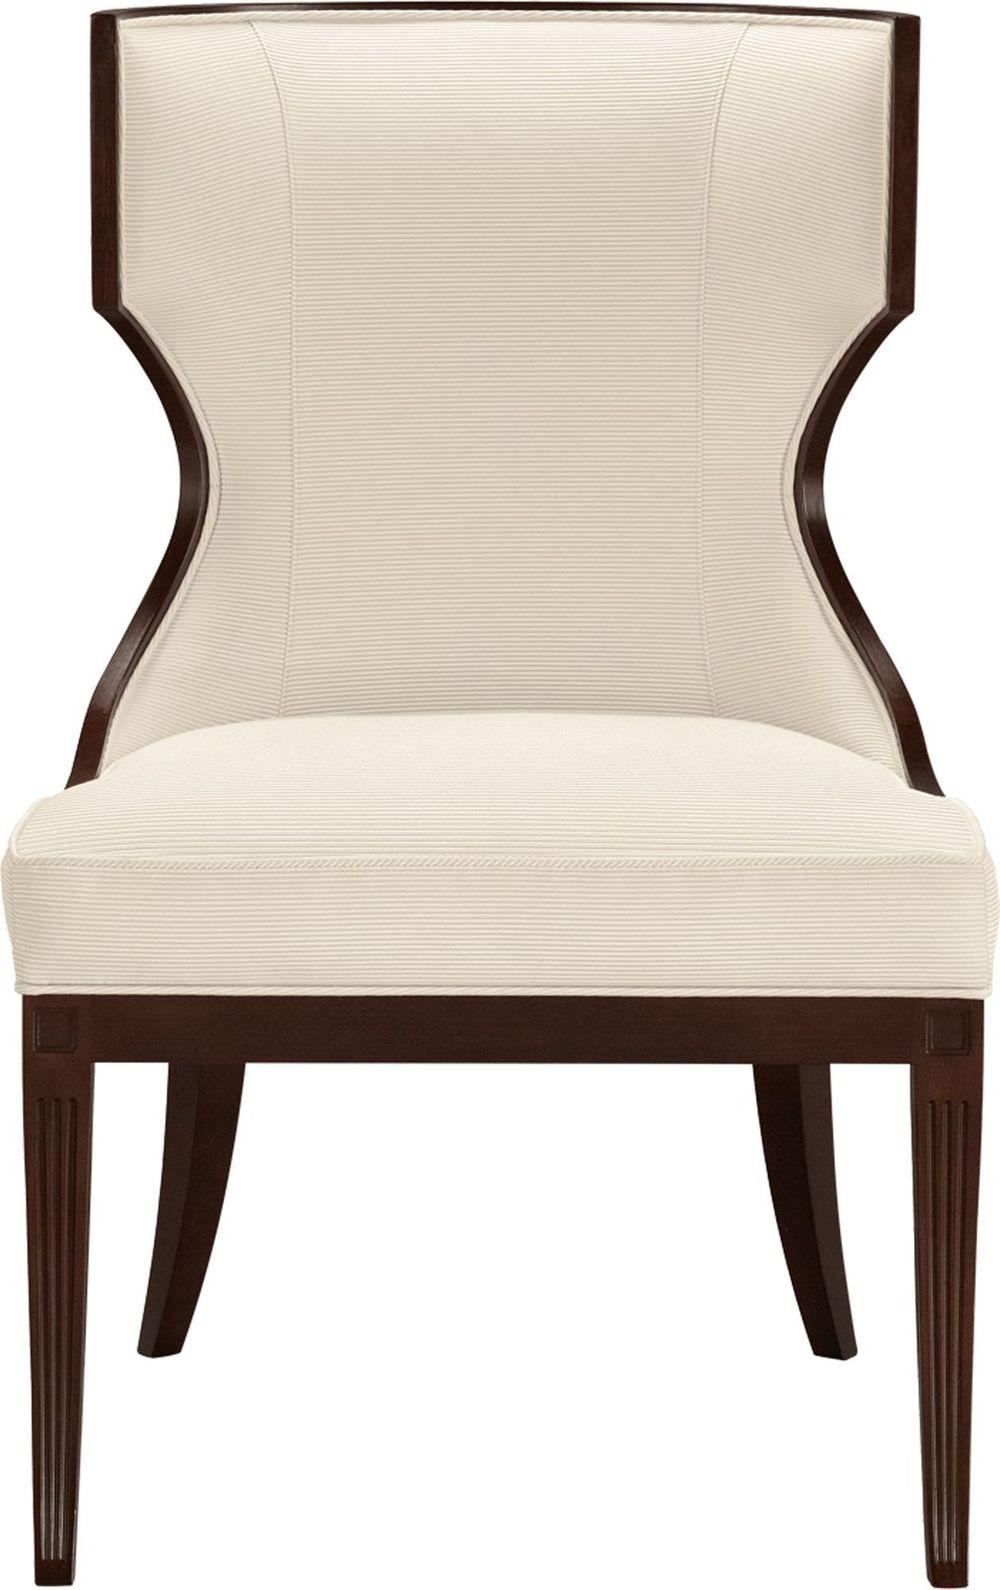 Baker Furniture - Marat Dining Chair